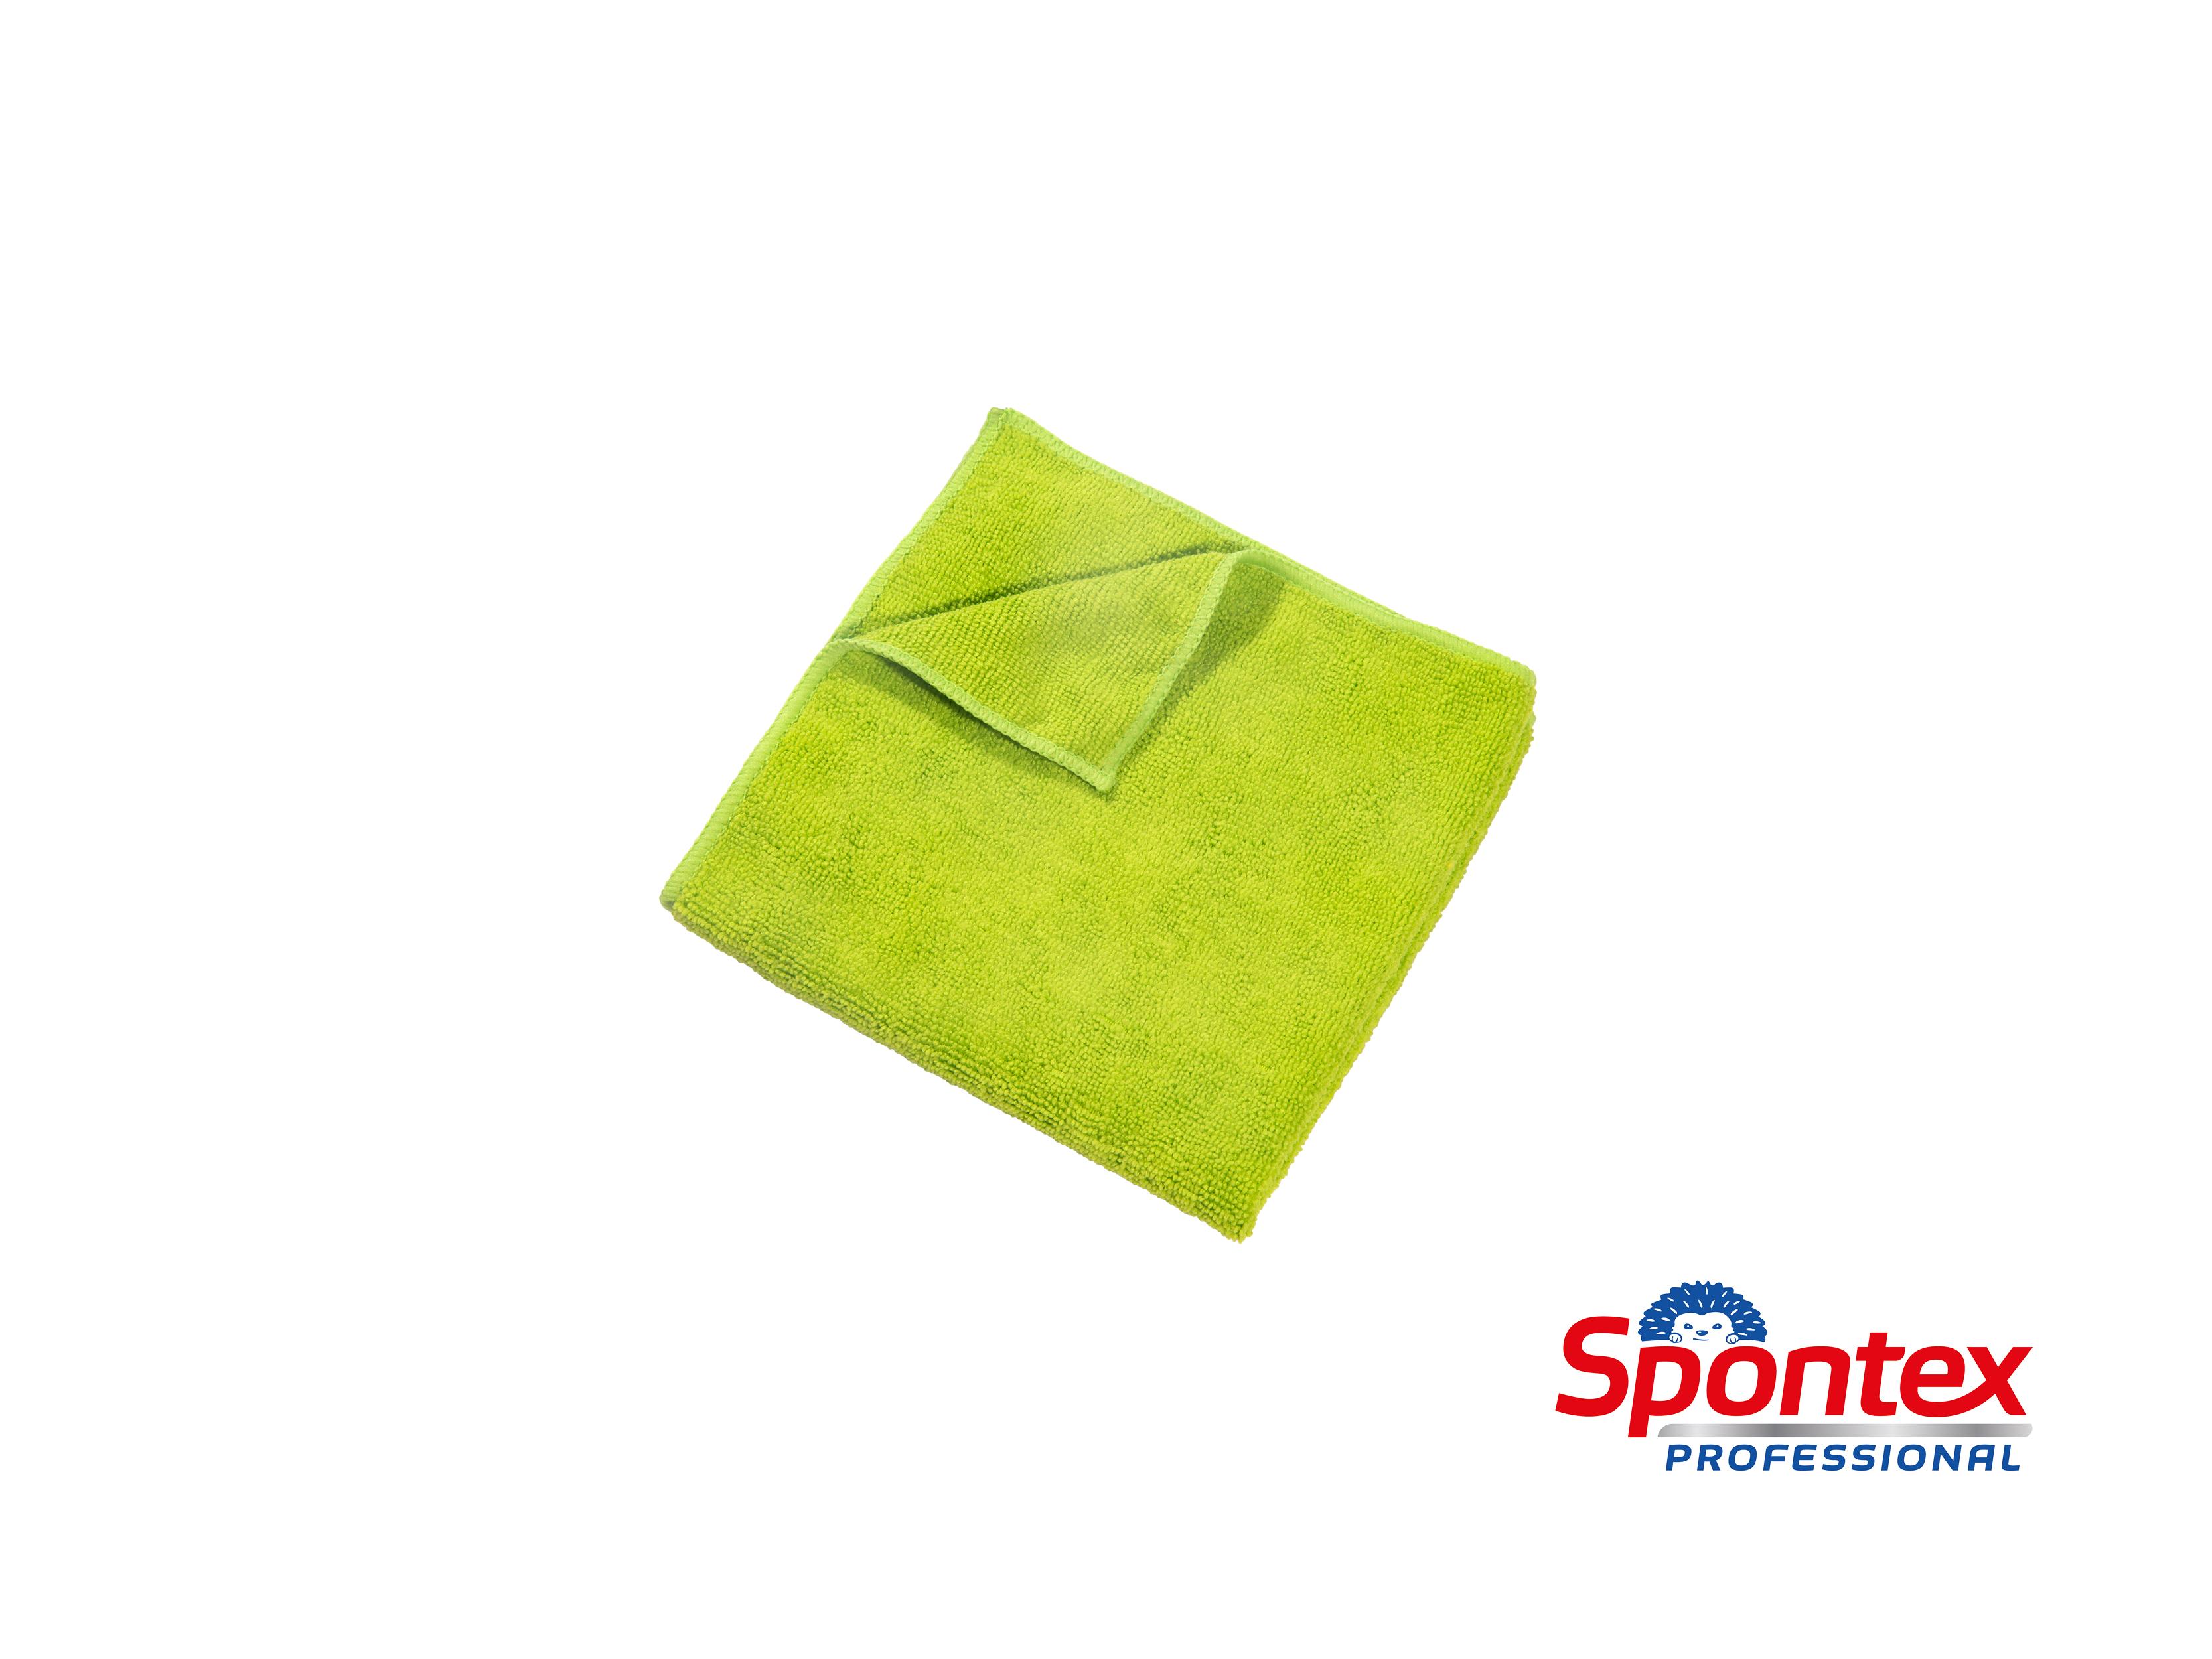 MF Pro Multiclean Green SPONTEX